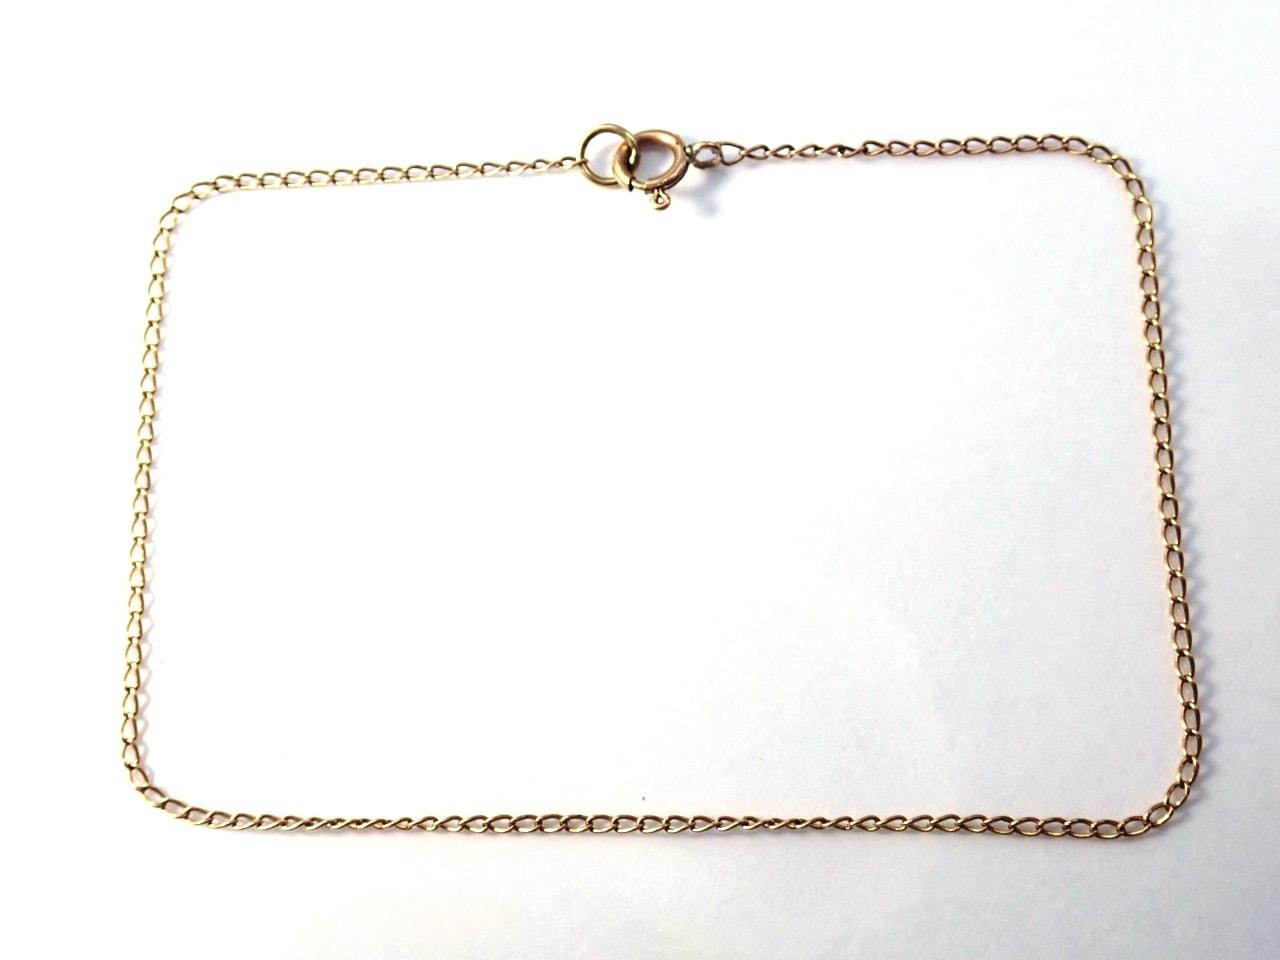 9K Gold Anchor Chain Bracelet - Anklet 8